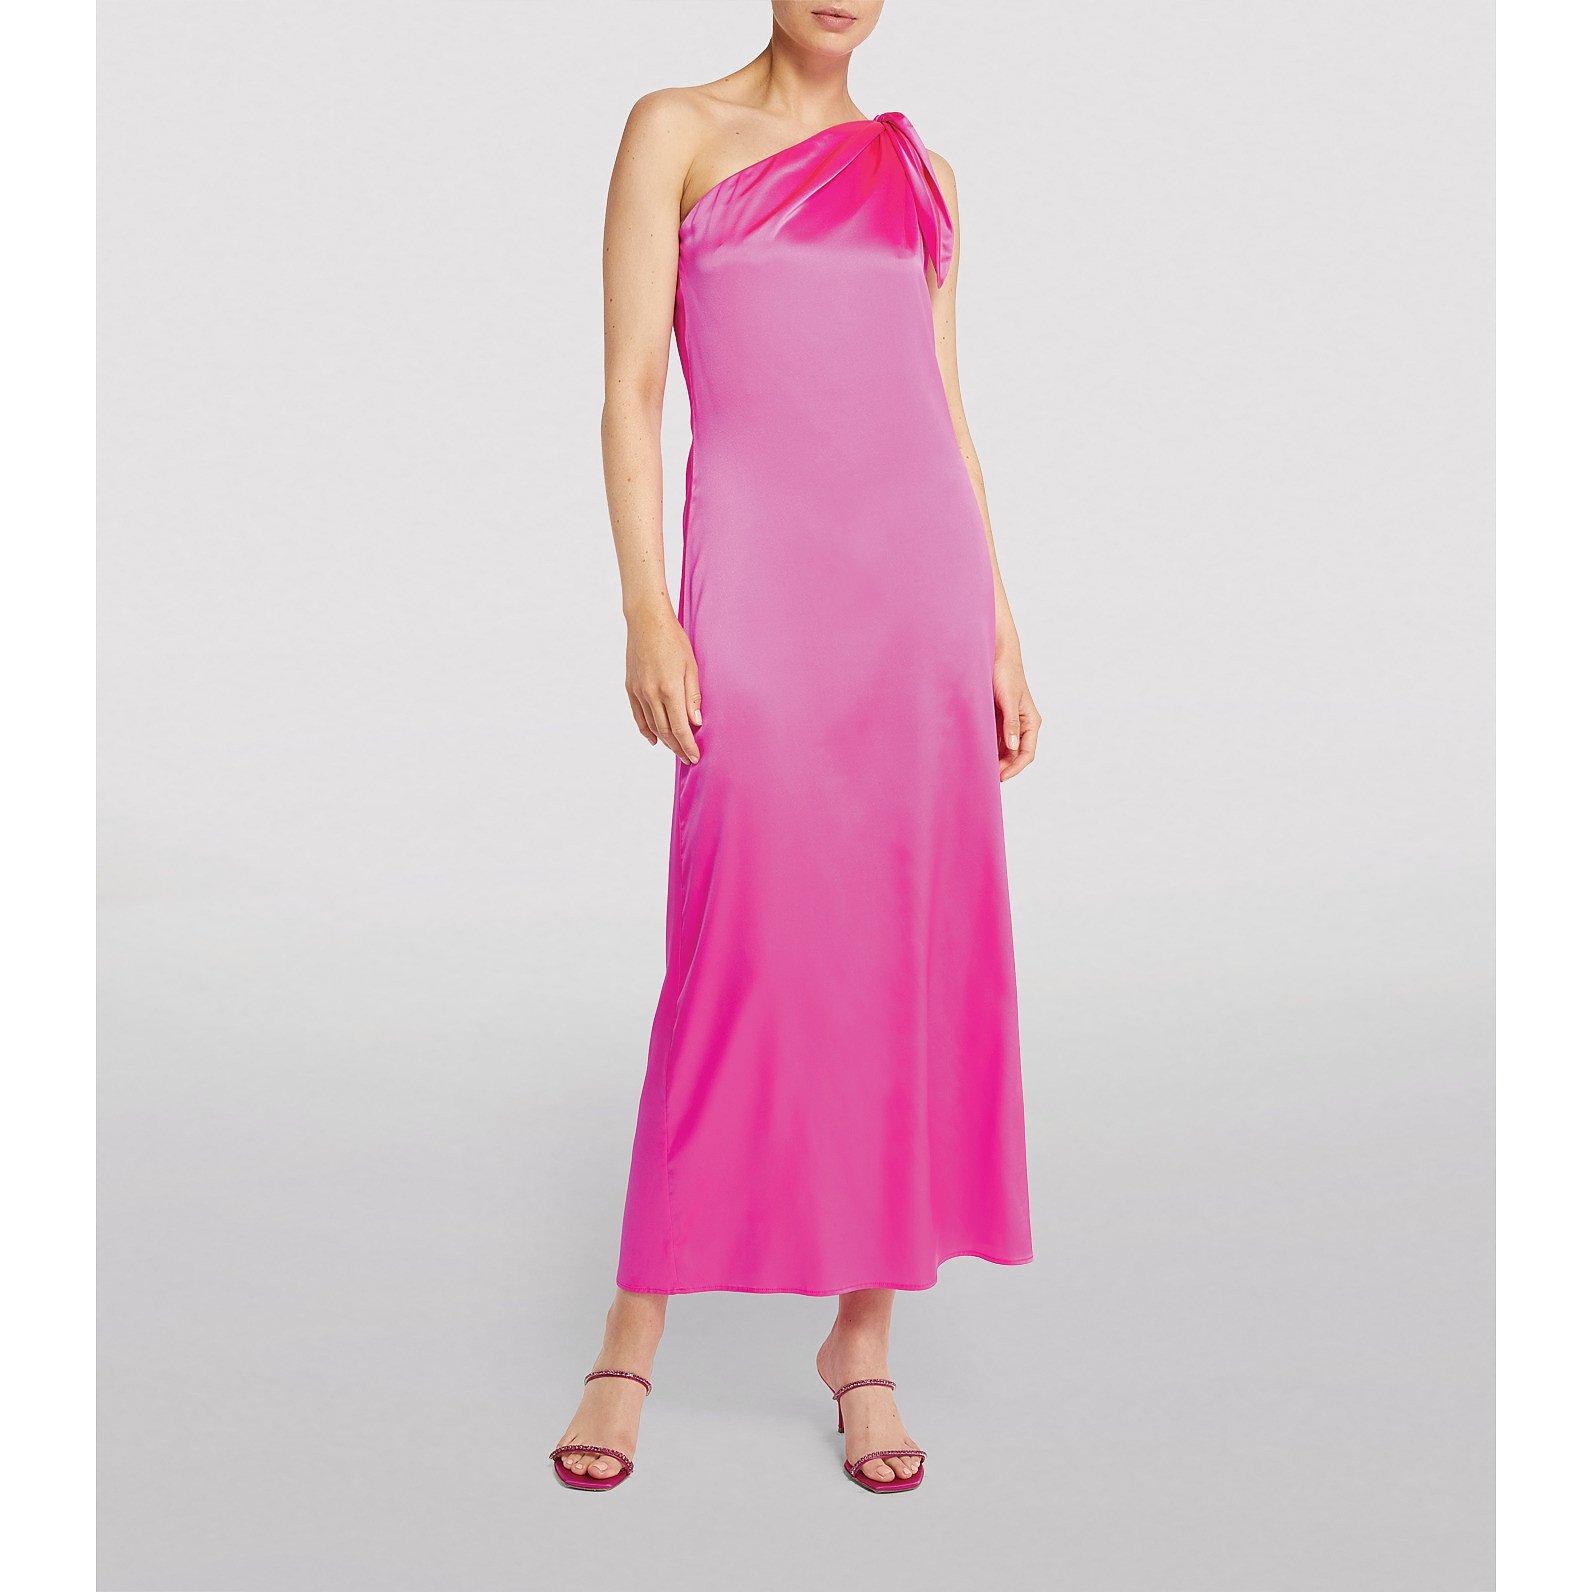 Bernadette Lucy One-Shoulder Dress